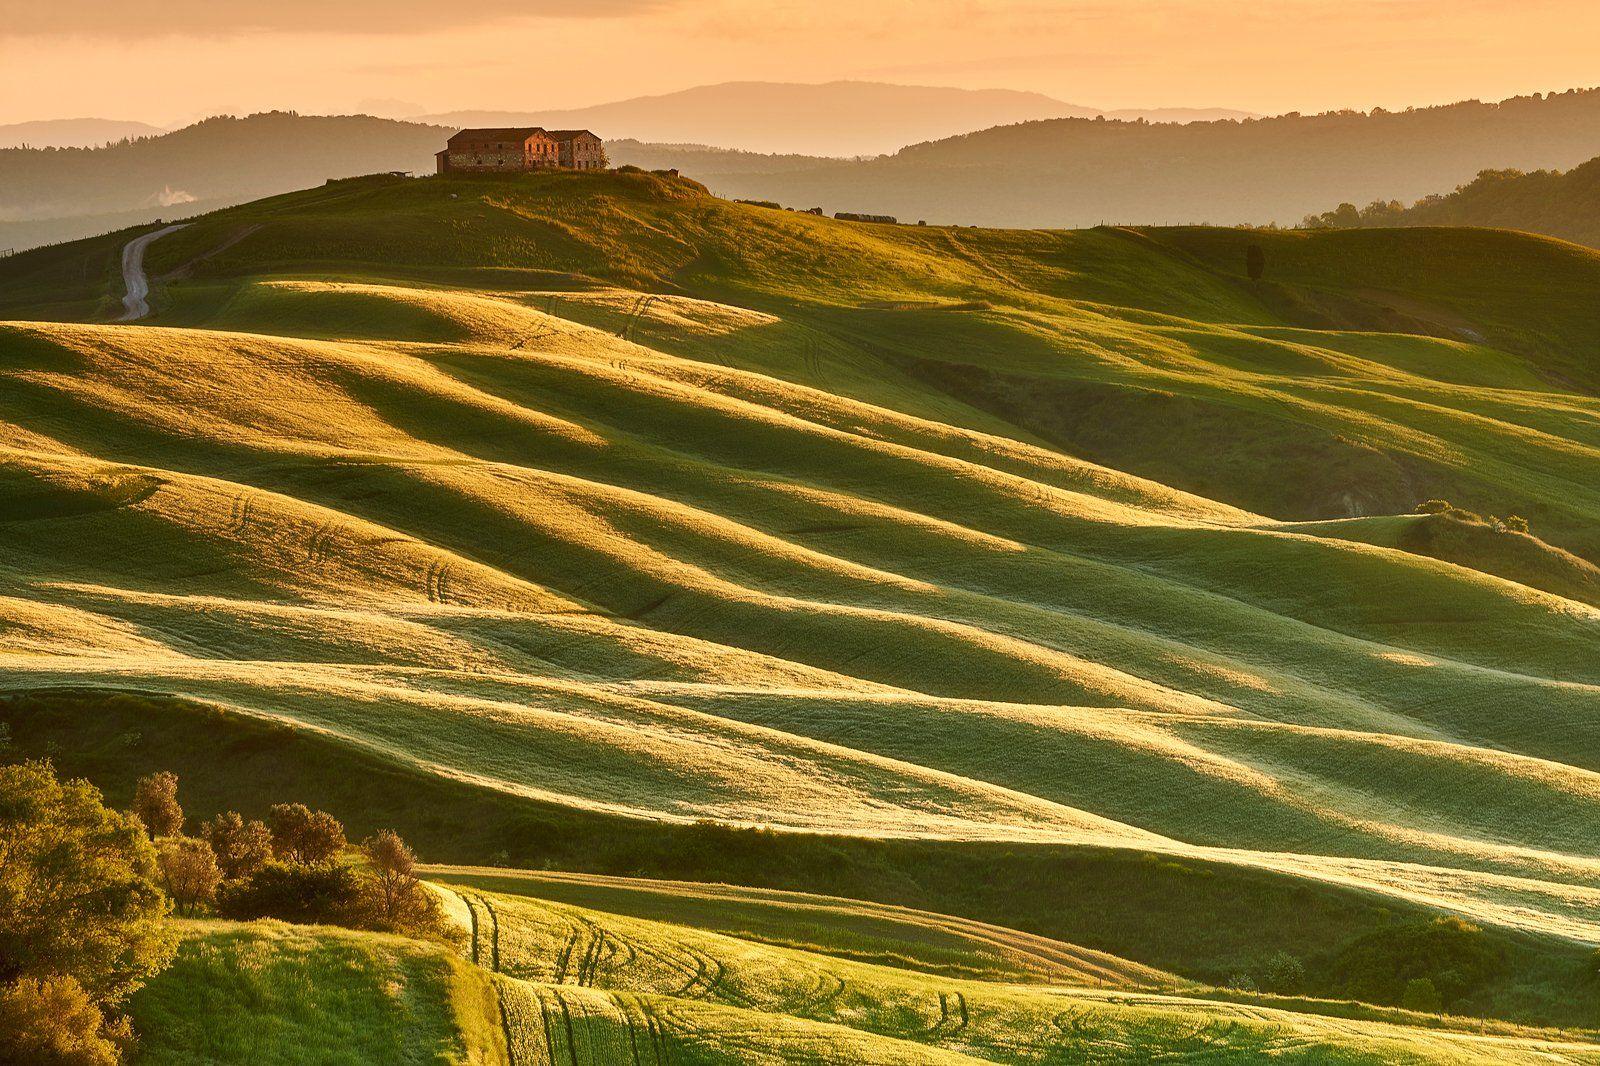 sunrise, tuscany, spring, farm, Jakub